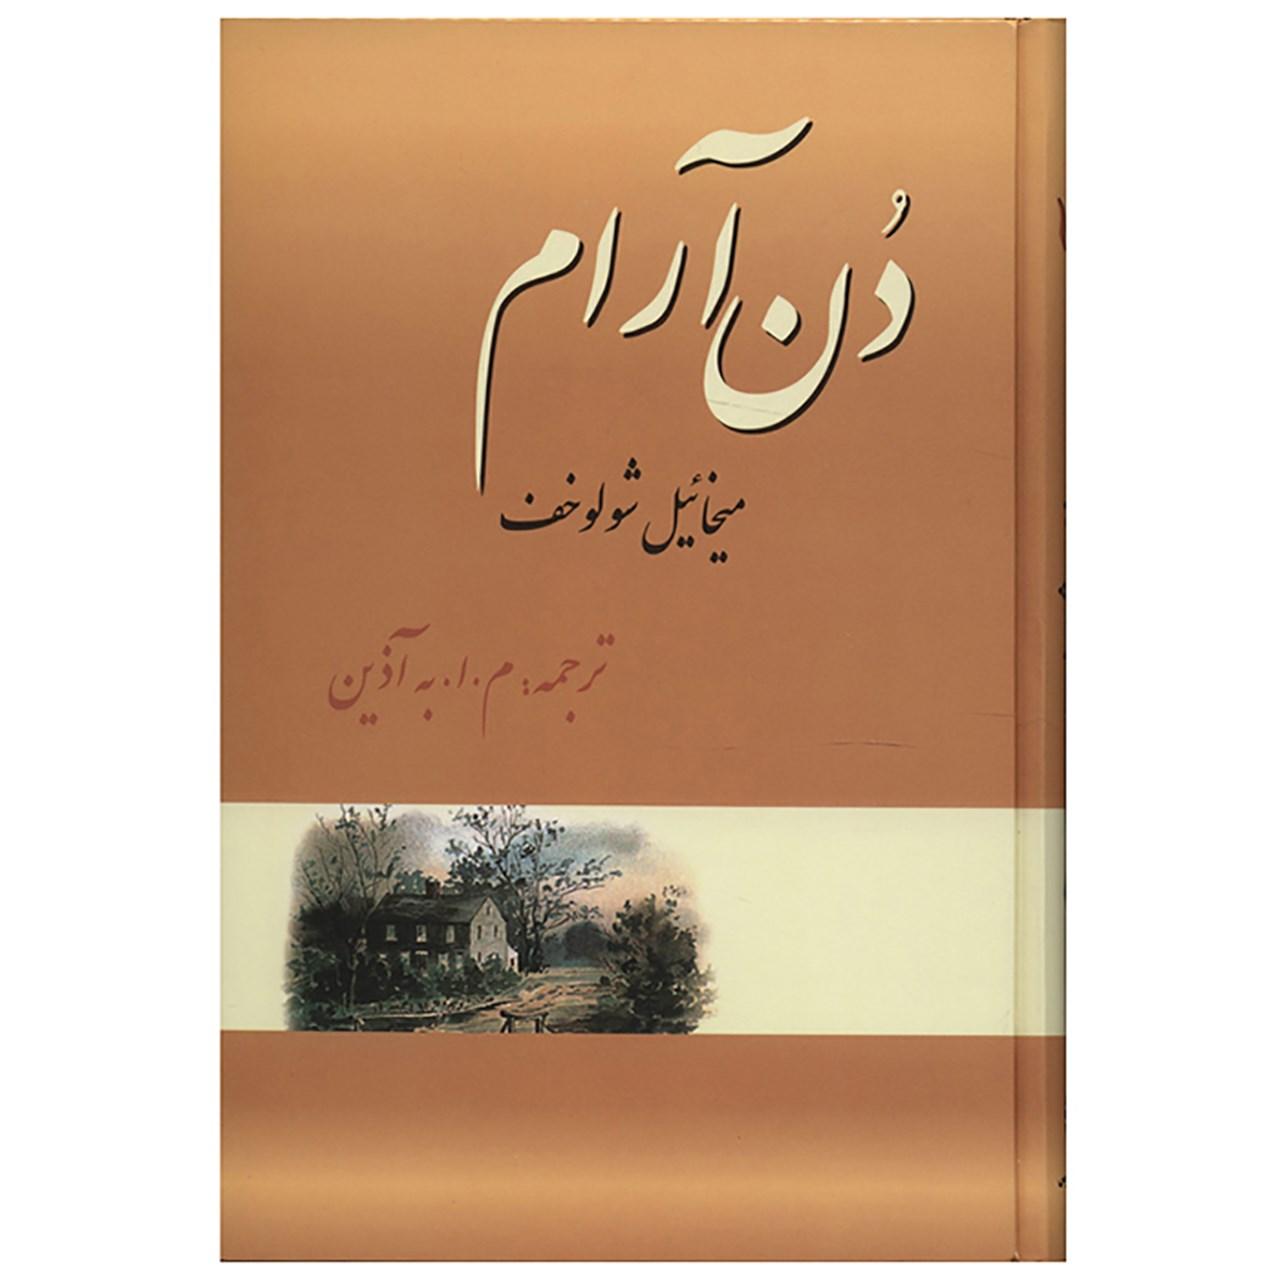 کتاب دن آرام اثر میخائیل شولوخوف - چهار جلدی